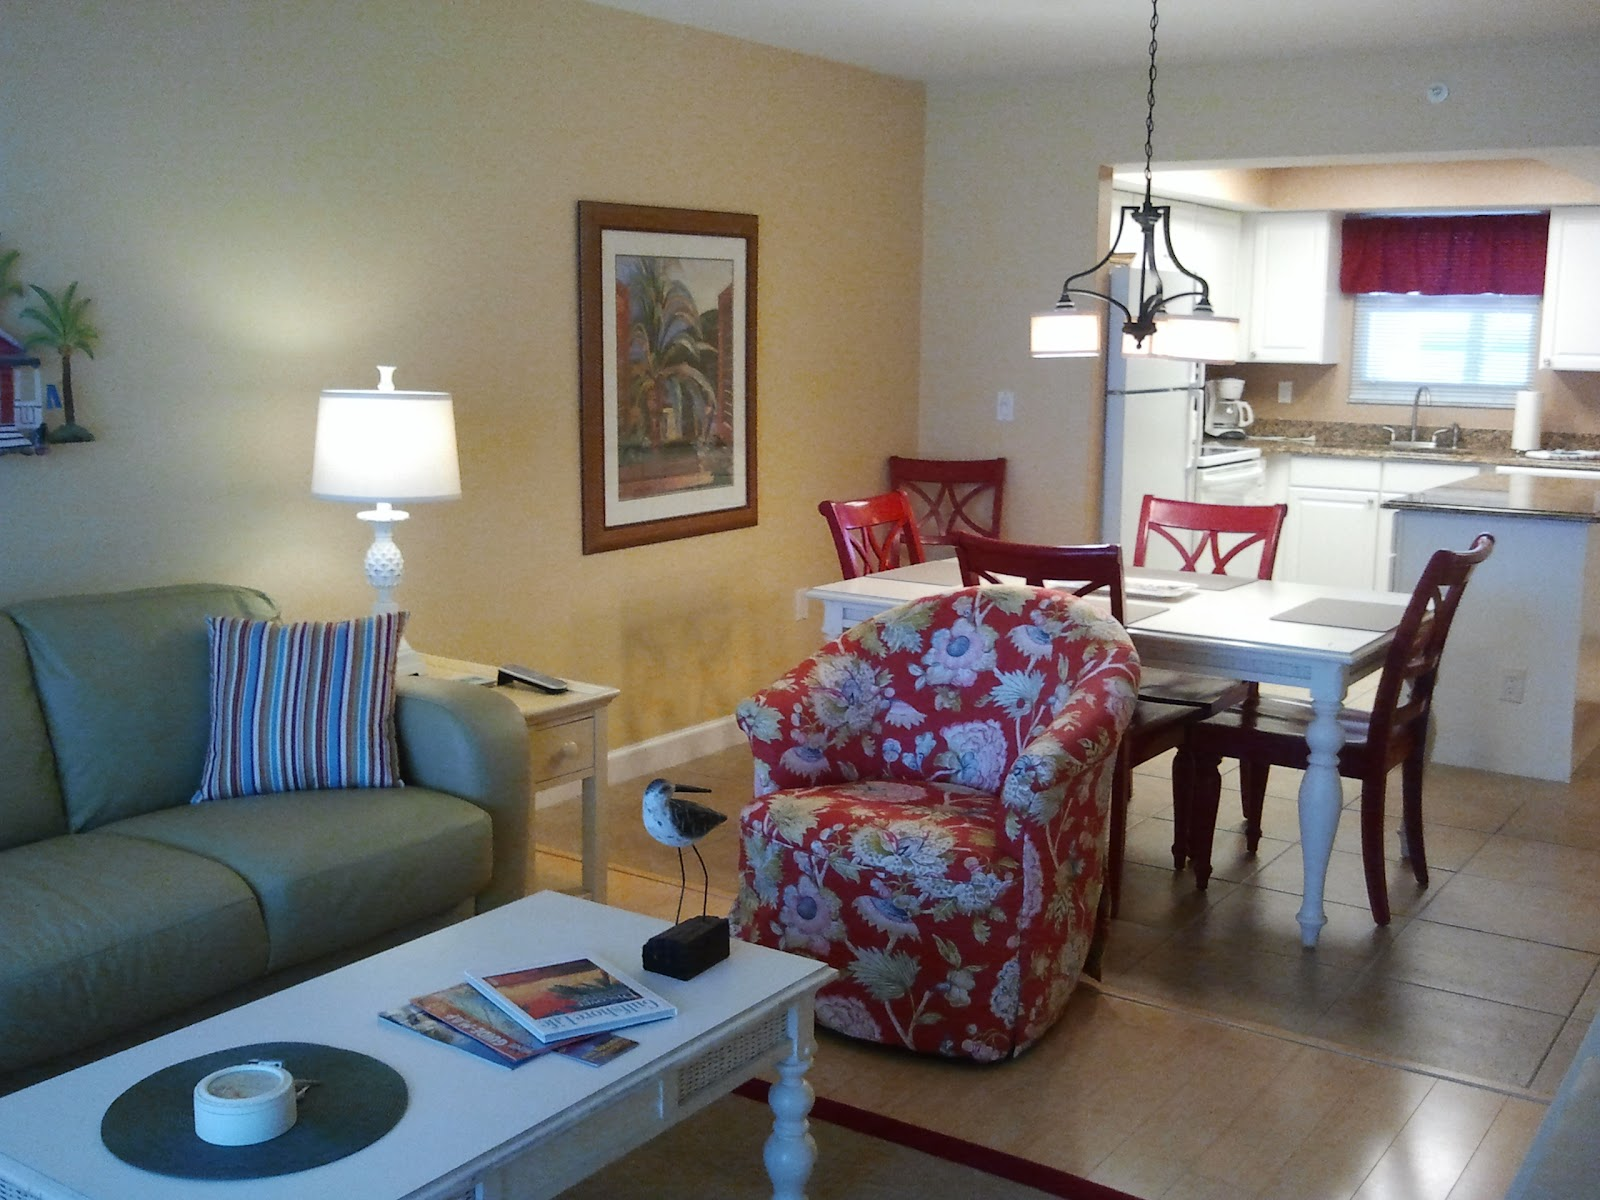 Room Makeover Ideas   Beach Condo   Home Decor HD